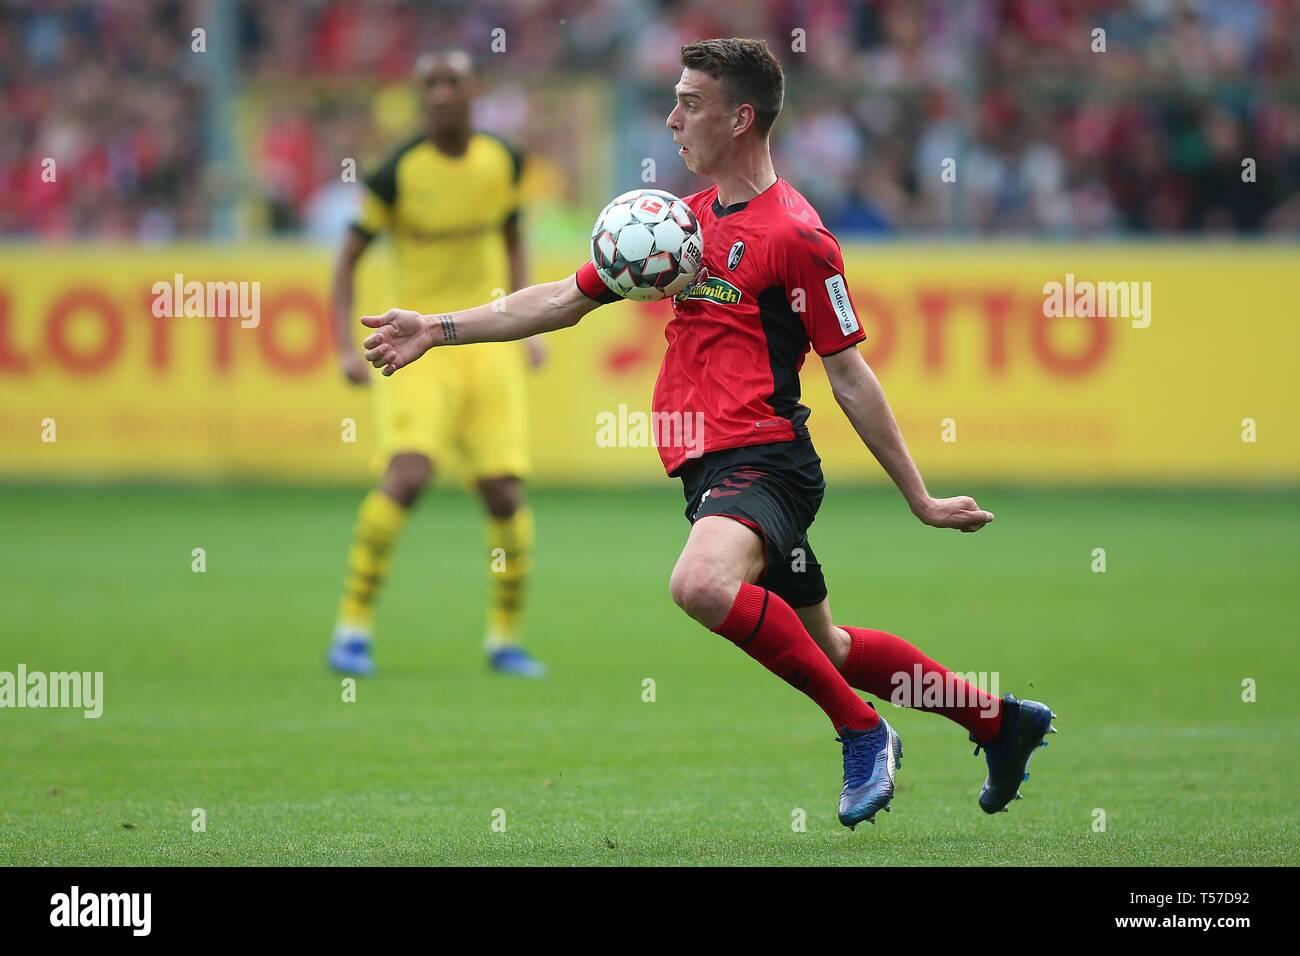 firo: 21.04.2019, football, 1.Bundesliga, season 2018/2019, SC Freiburg - Borussia Dortmund, single action, full figure,   usage worldwide - Stock Image